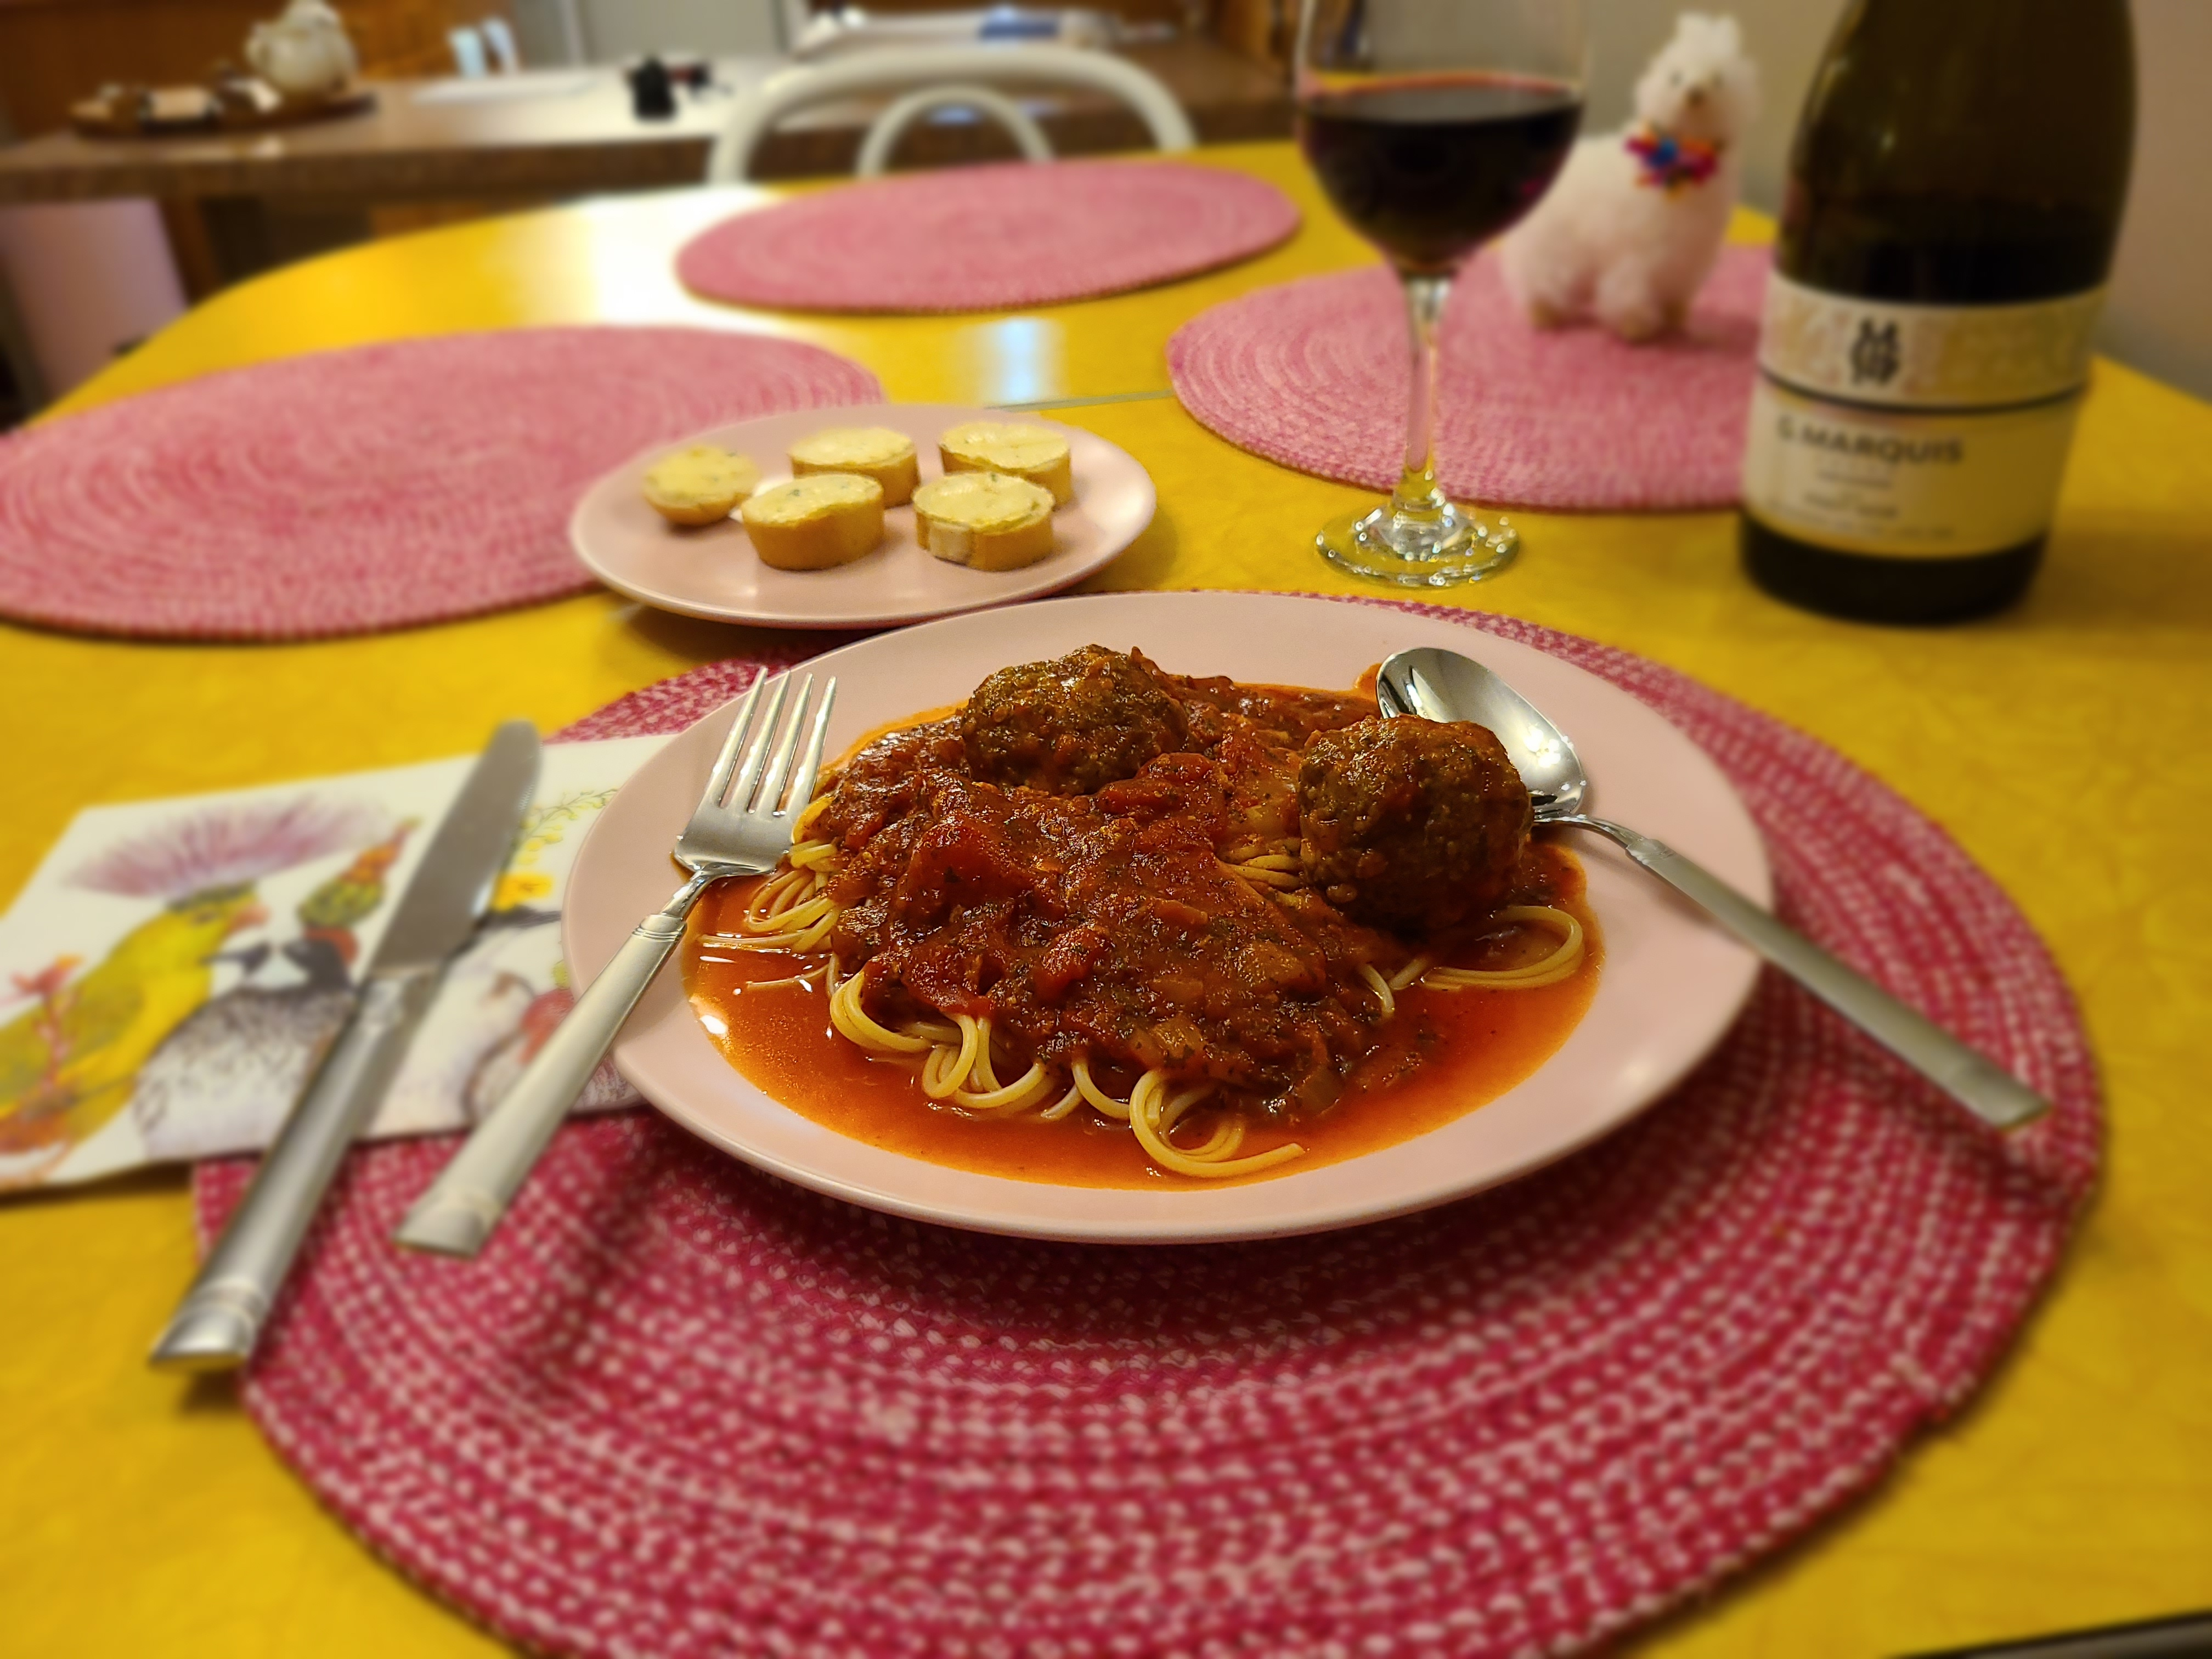 Homemade Spaghetti and Meatballs Liz Kadziolka